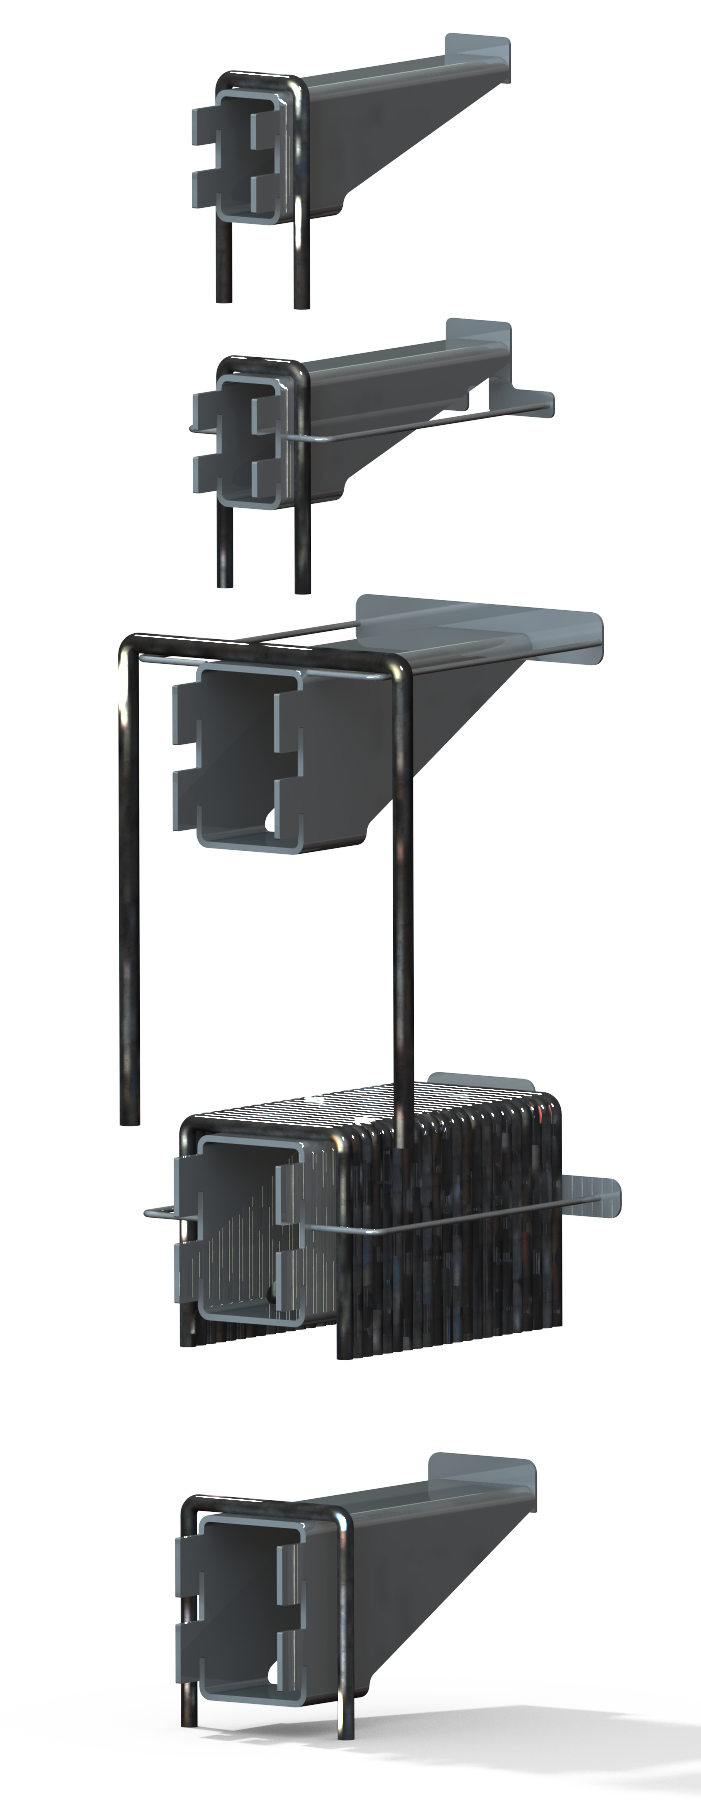 U-Bolt Rack Module Set - Back View - Designed in SolidWorks - Kris Bunda